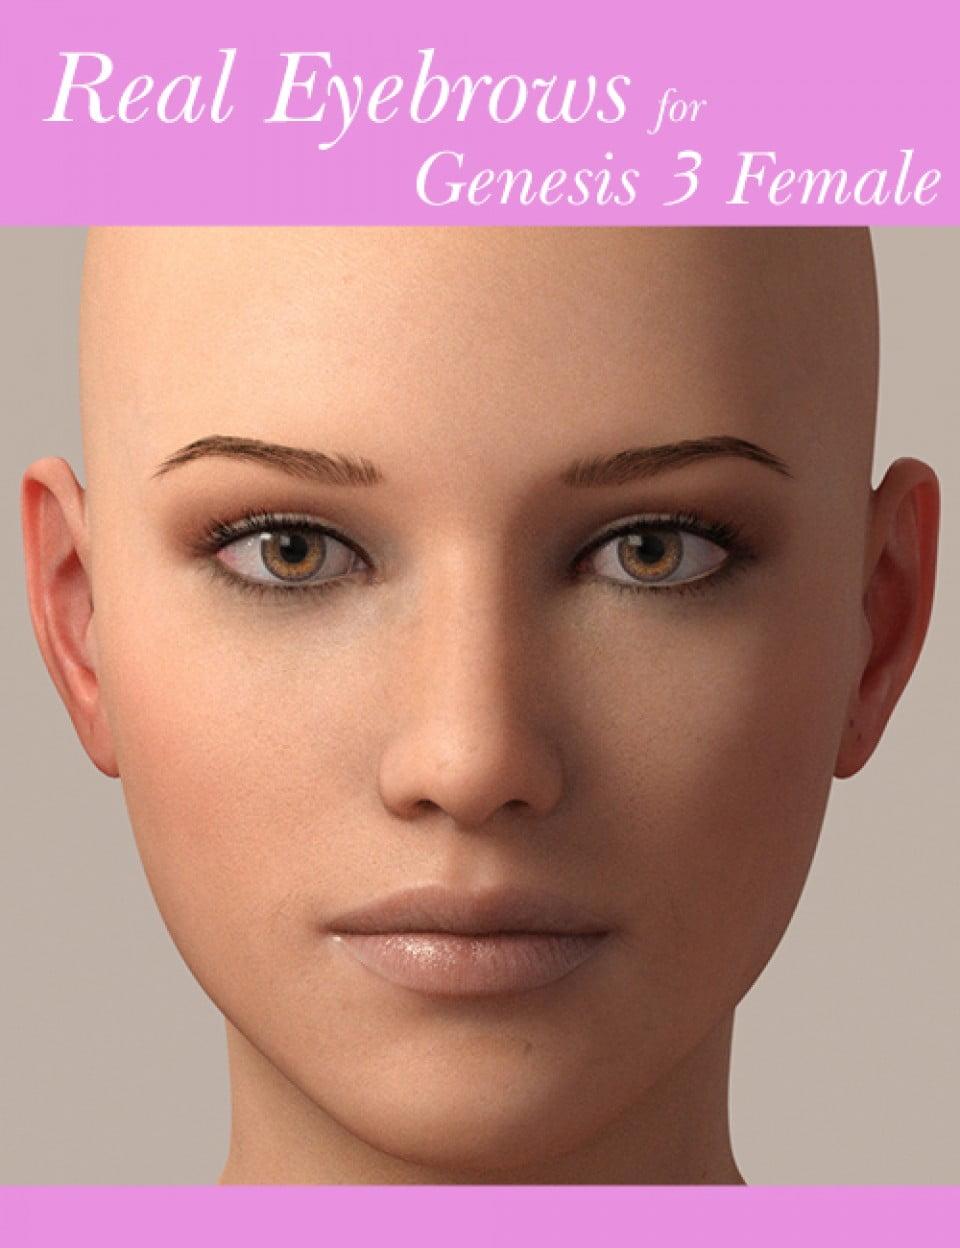 Real Eyebrows for Genesis 3 Female